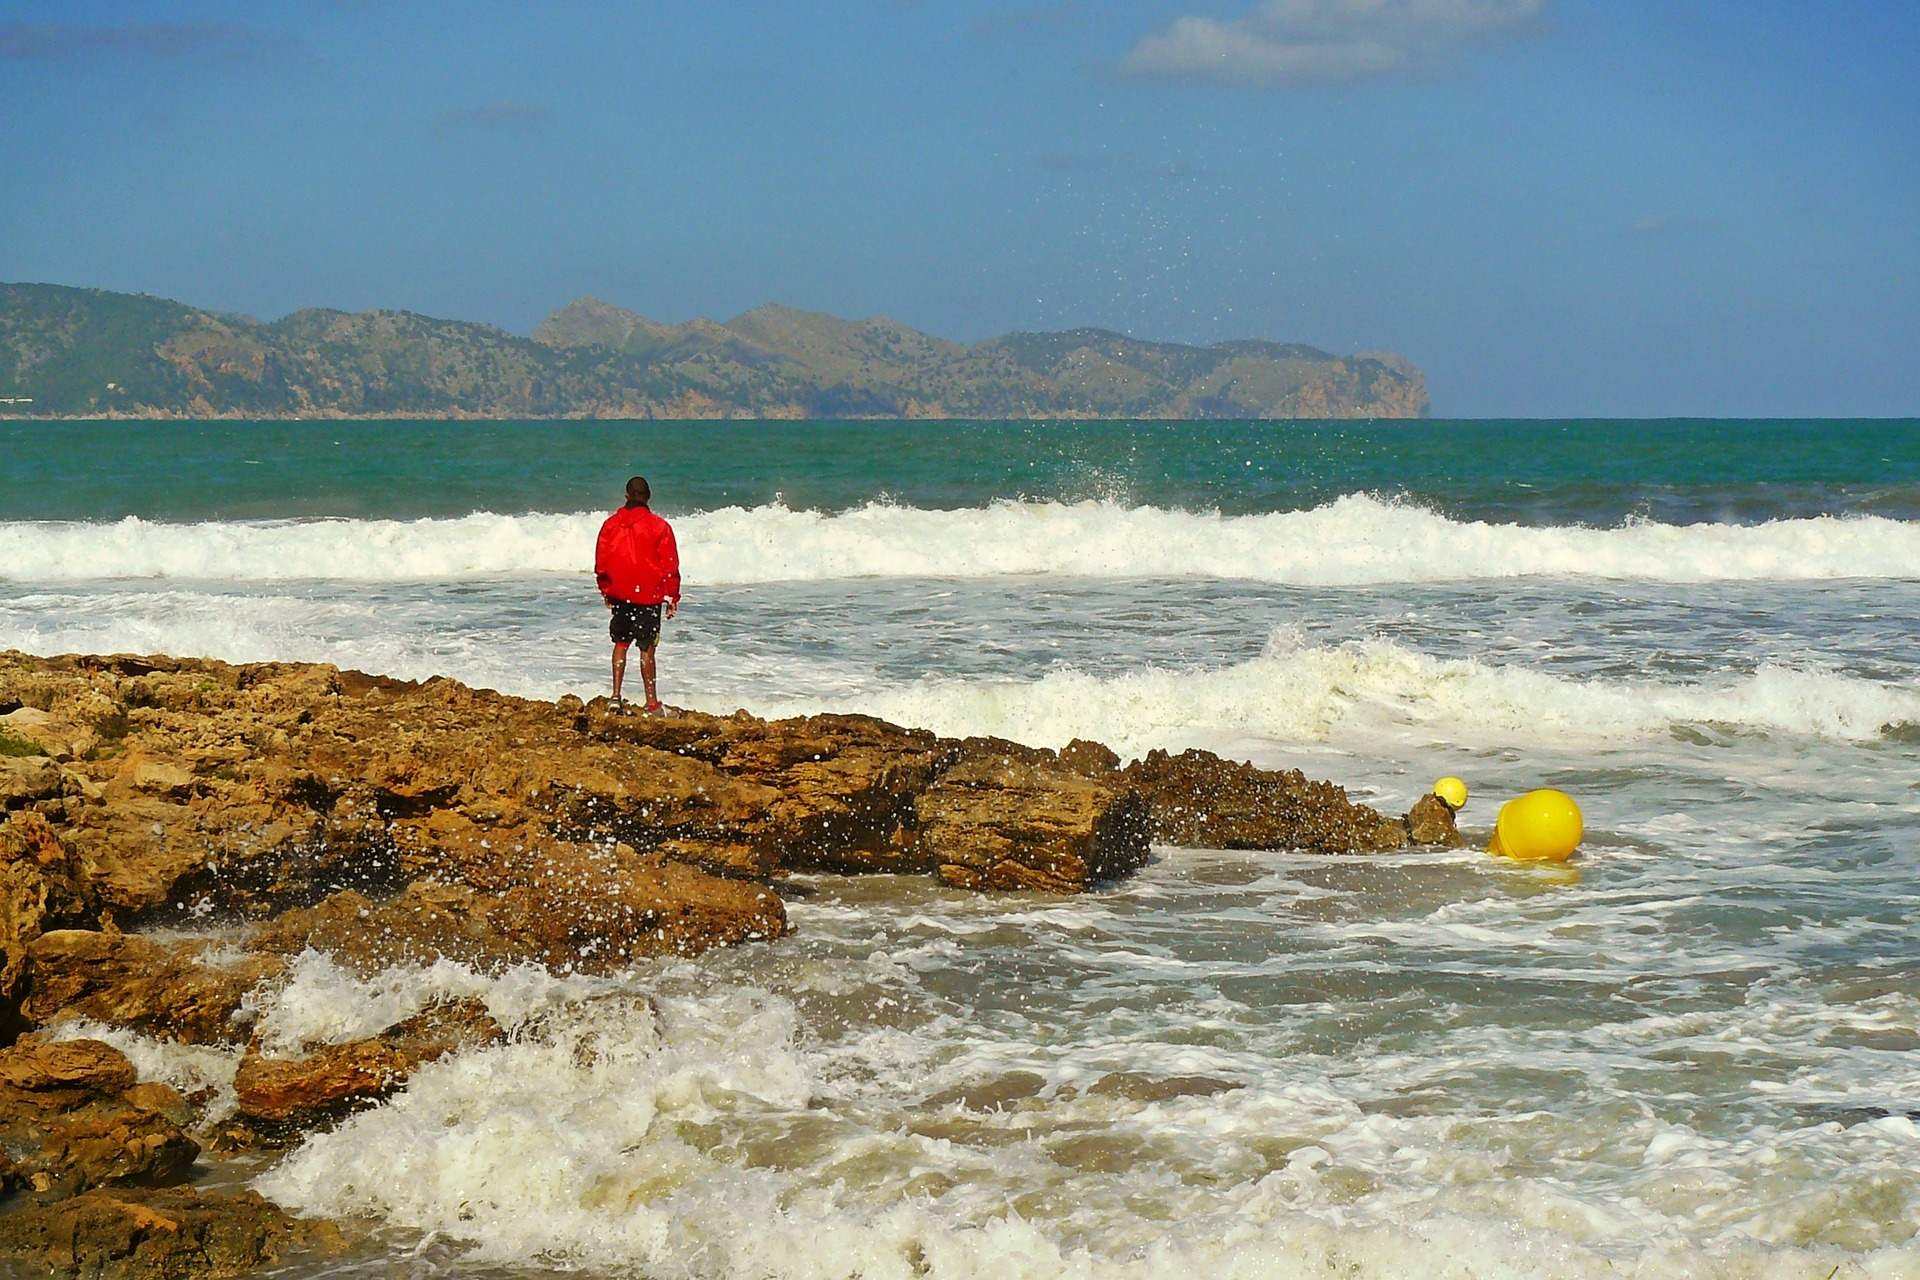 Man on the shore photo